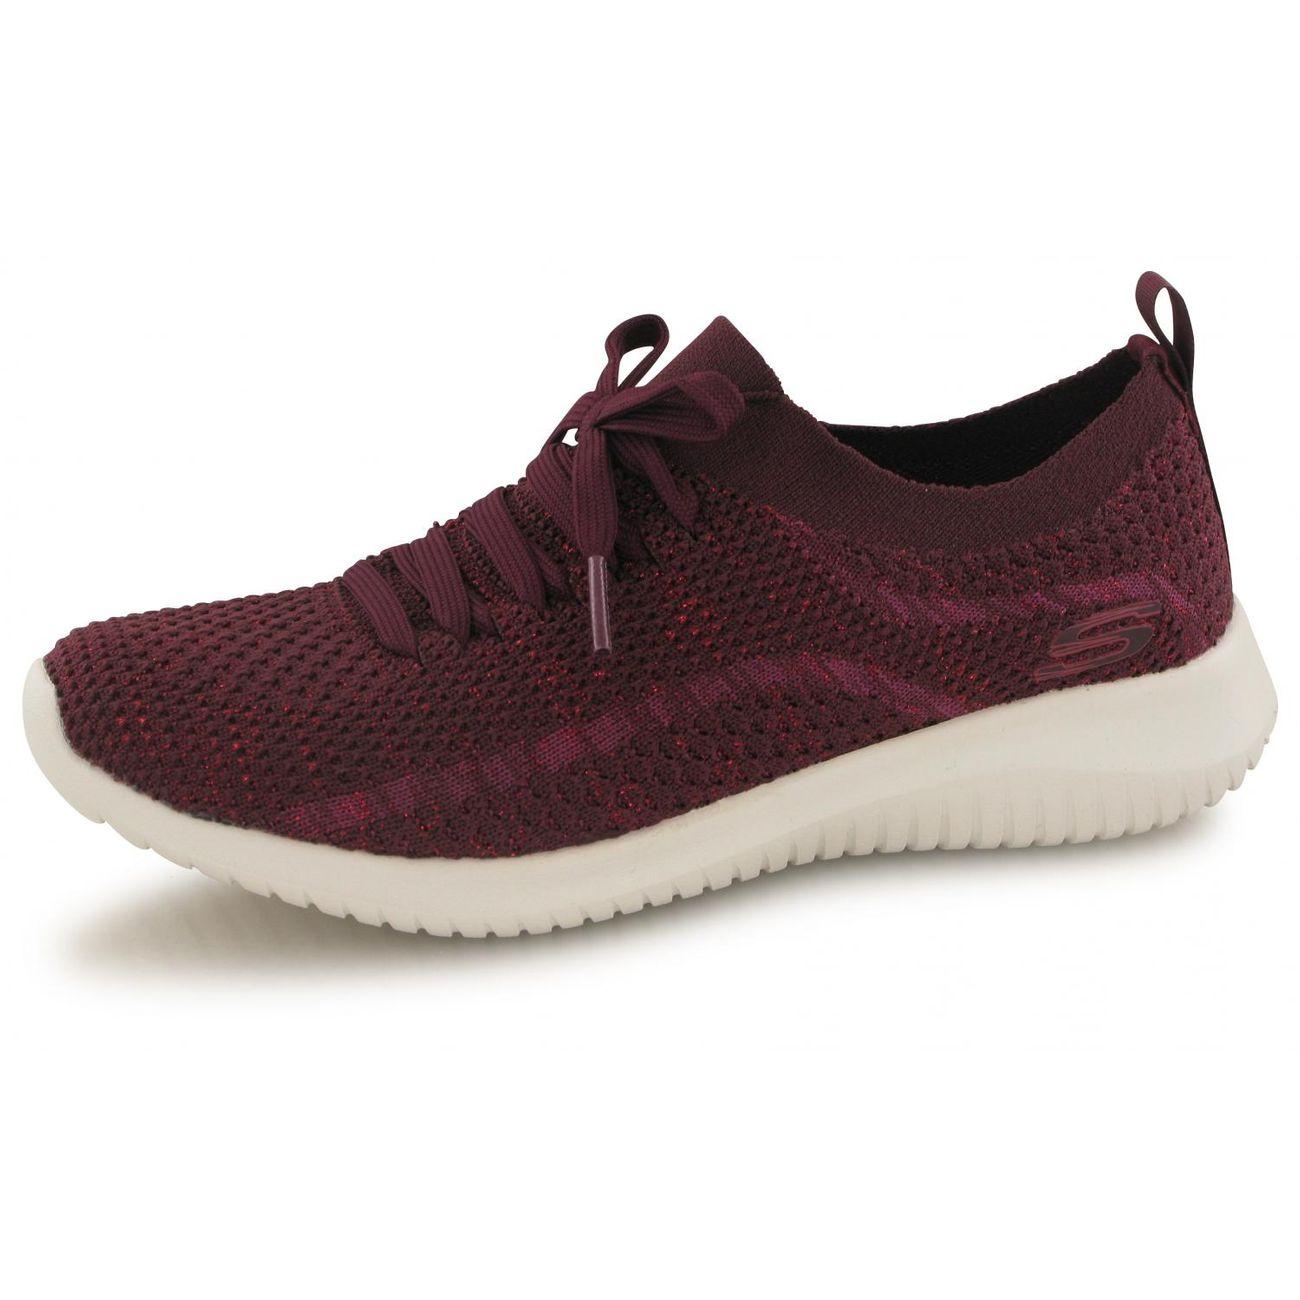 Chaussures Ultra Flex </p>                 <!--bof Quantity Discounts table -->                                 <!--eof Quantity Discounts table -->                  <!--bof Product URL -->                                 <!--eof Product URL -->             </div>             <div id=